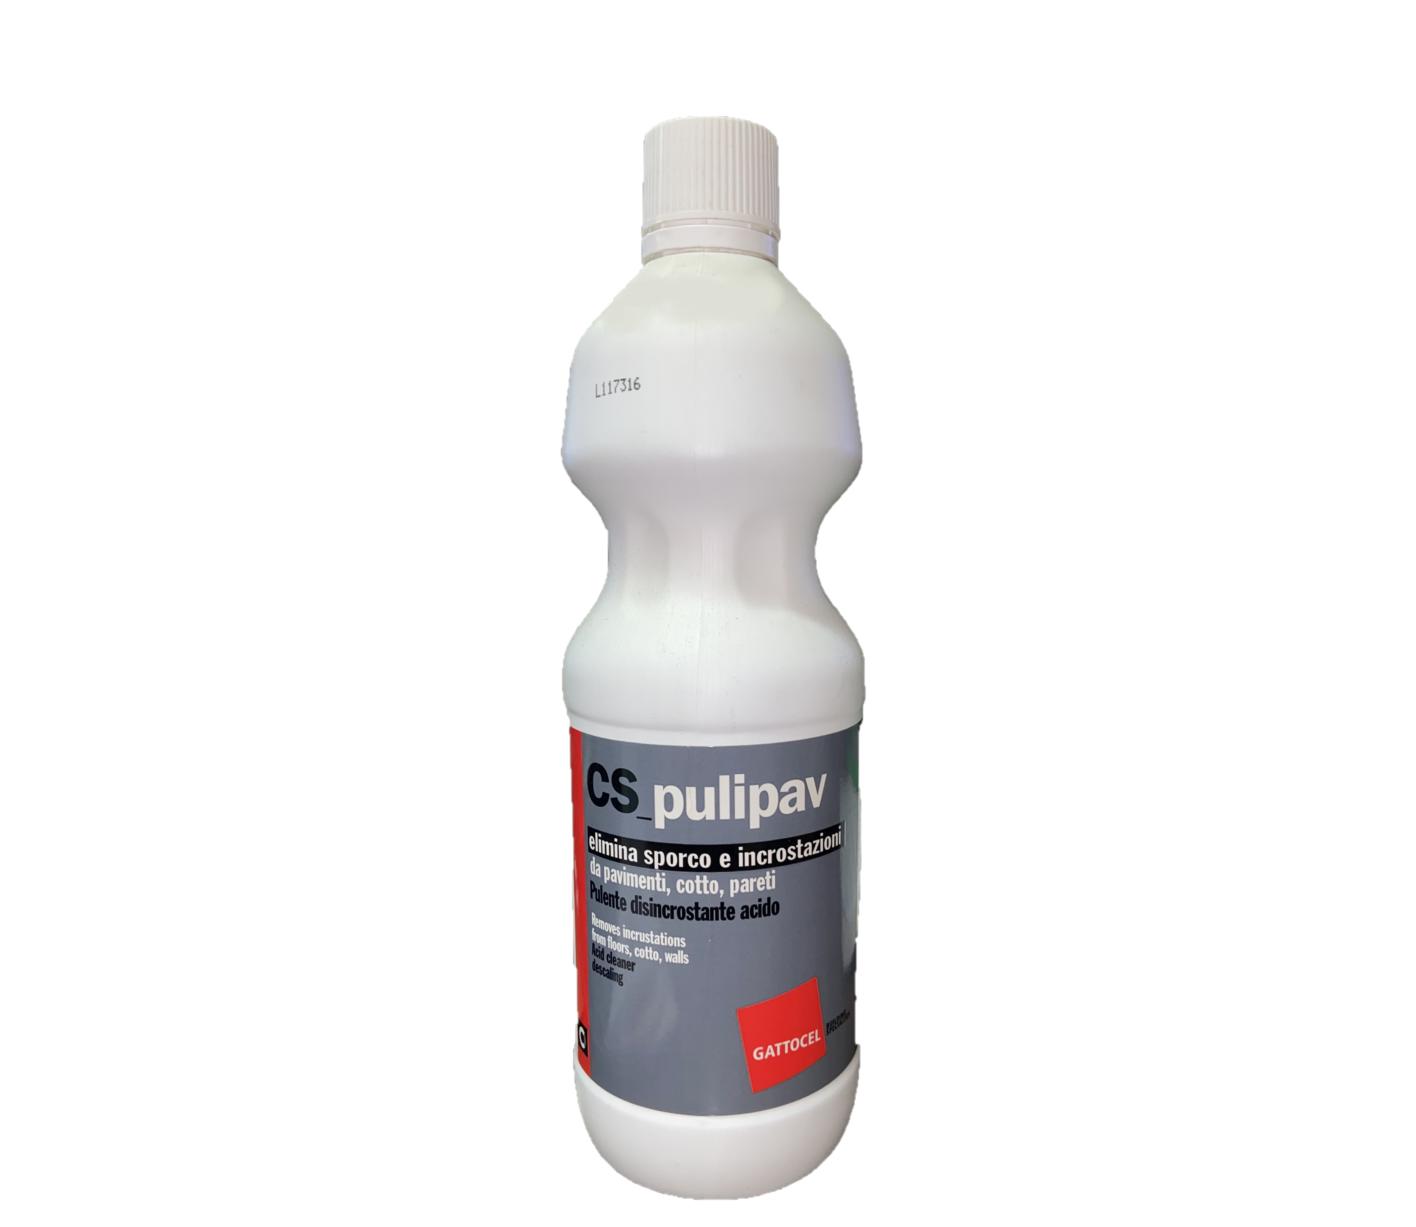 Pulente Acido CS Pulipav GATTOCEL 1lt